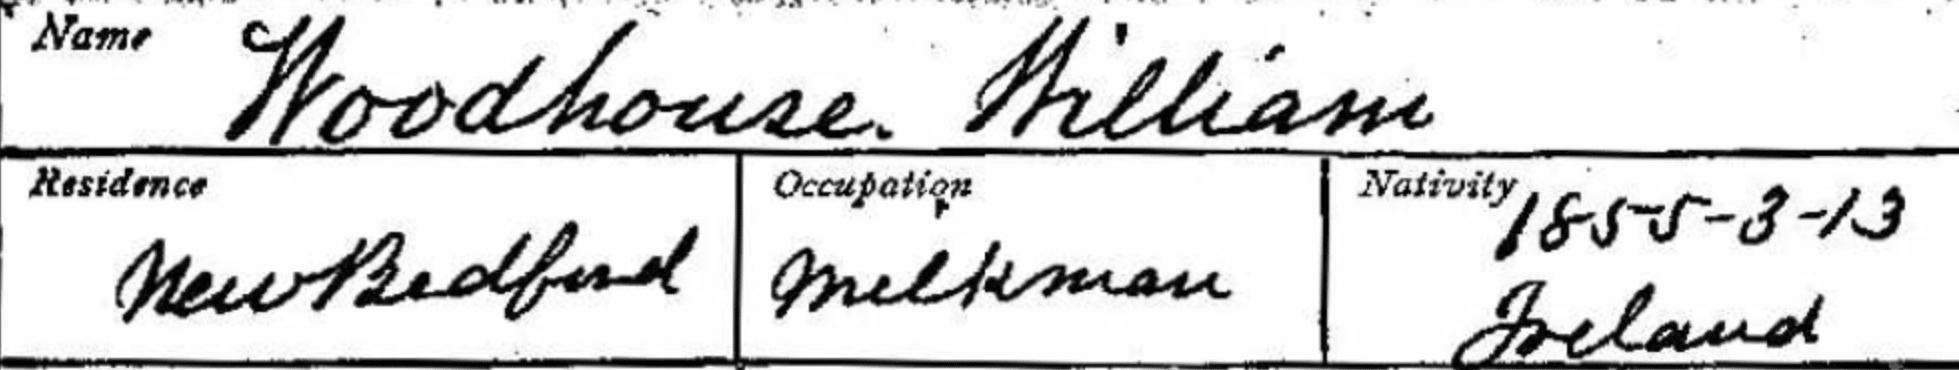 Mason Membership Card for William Woodhouse